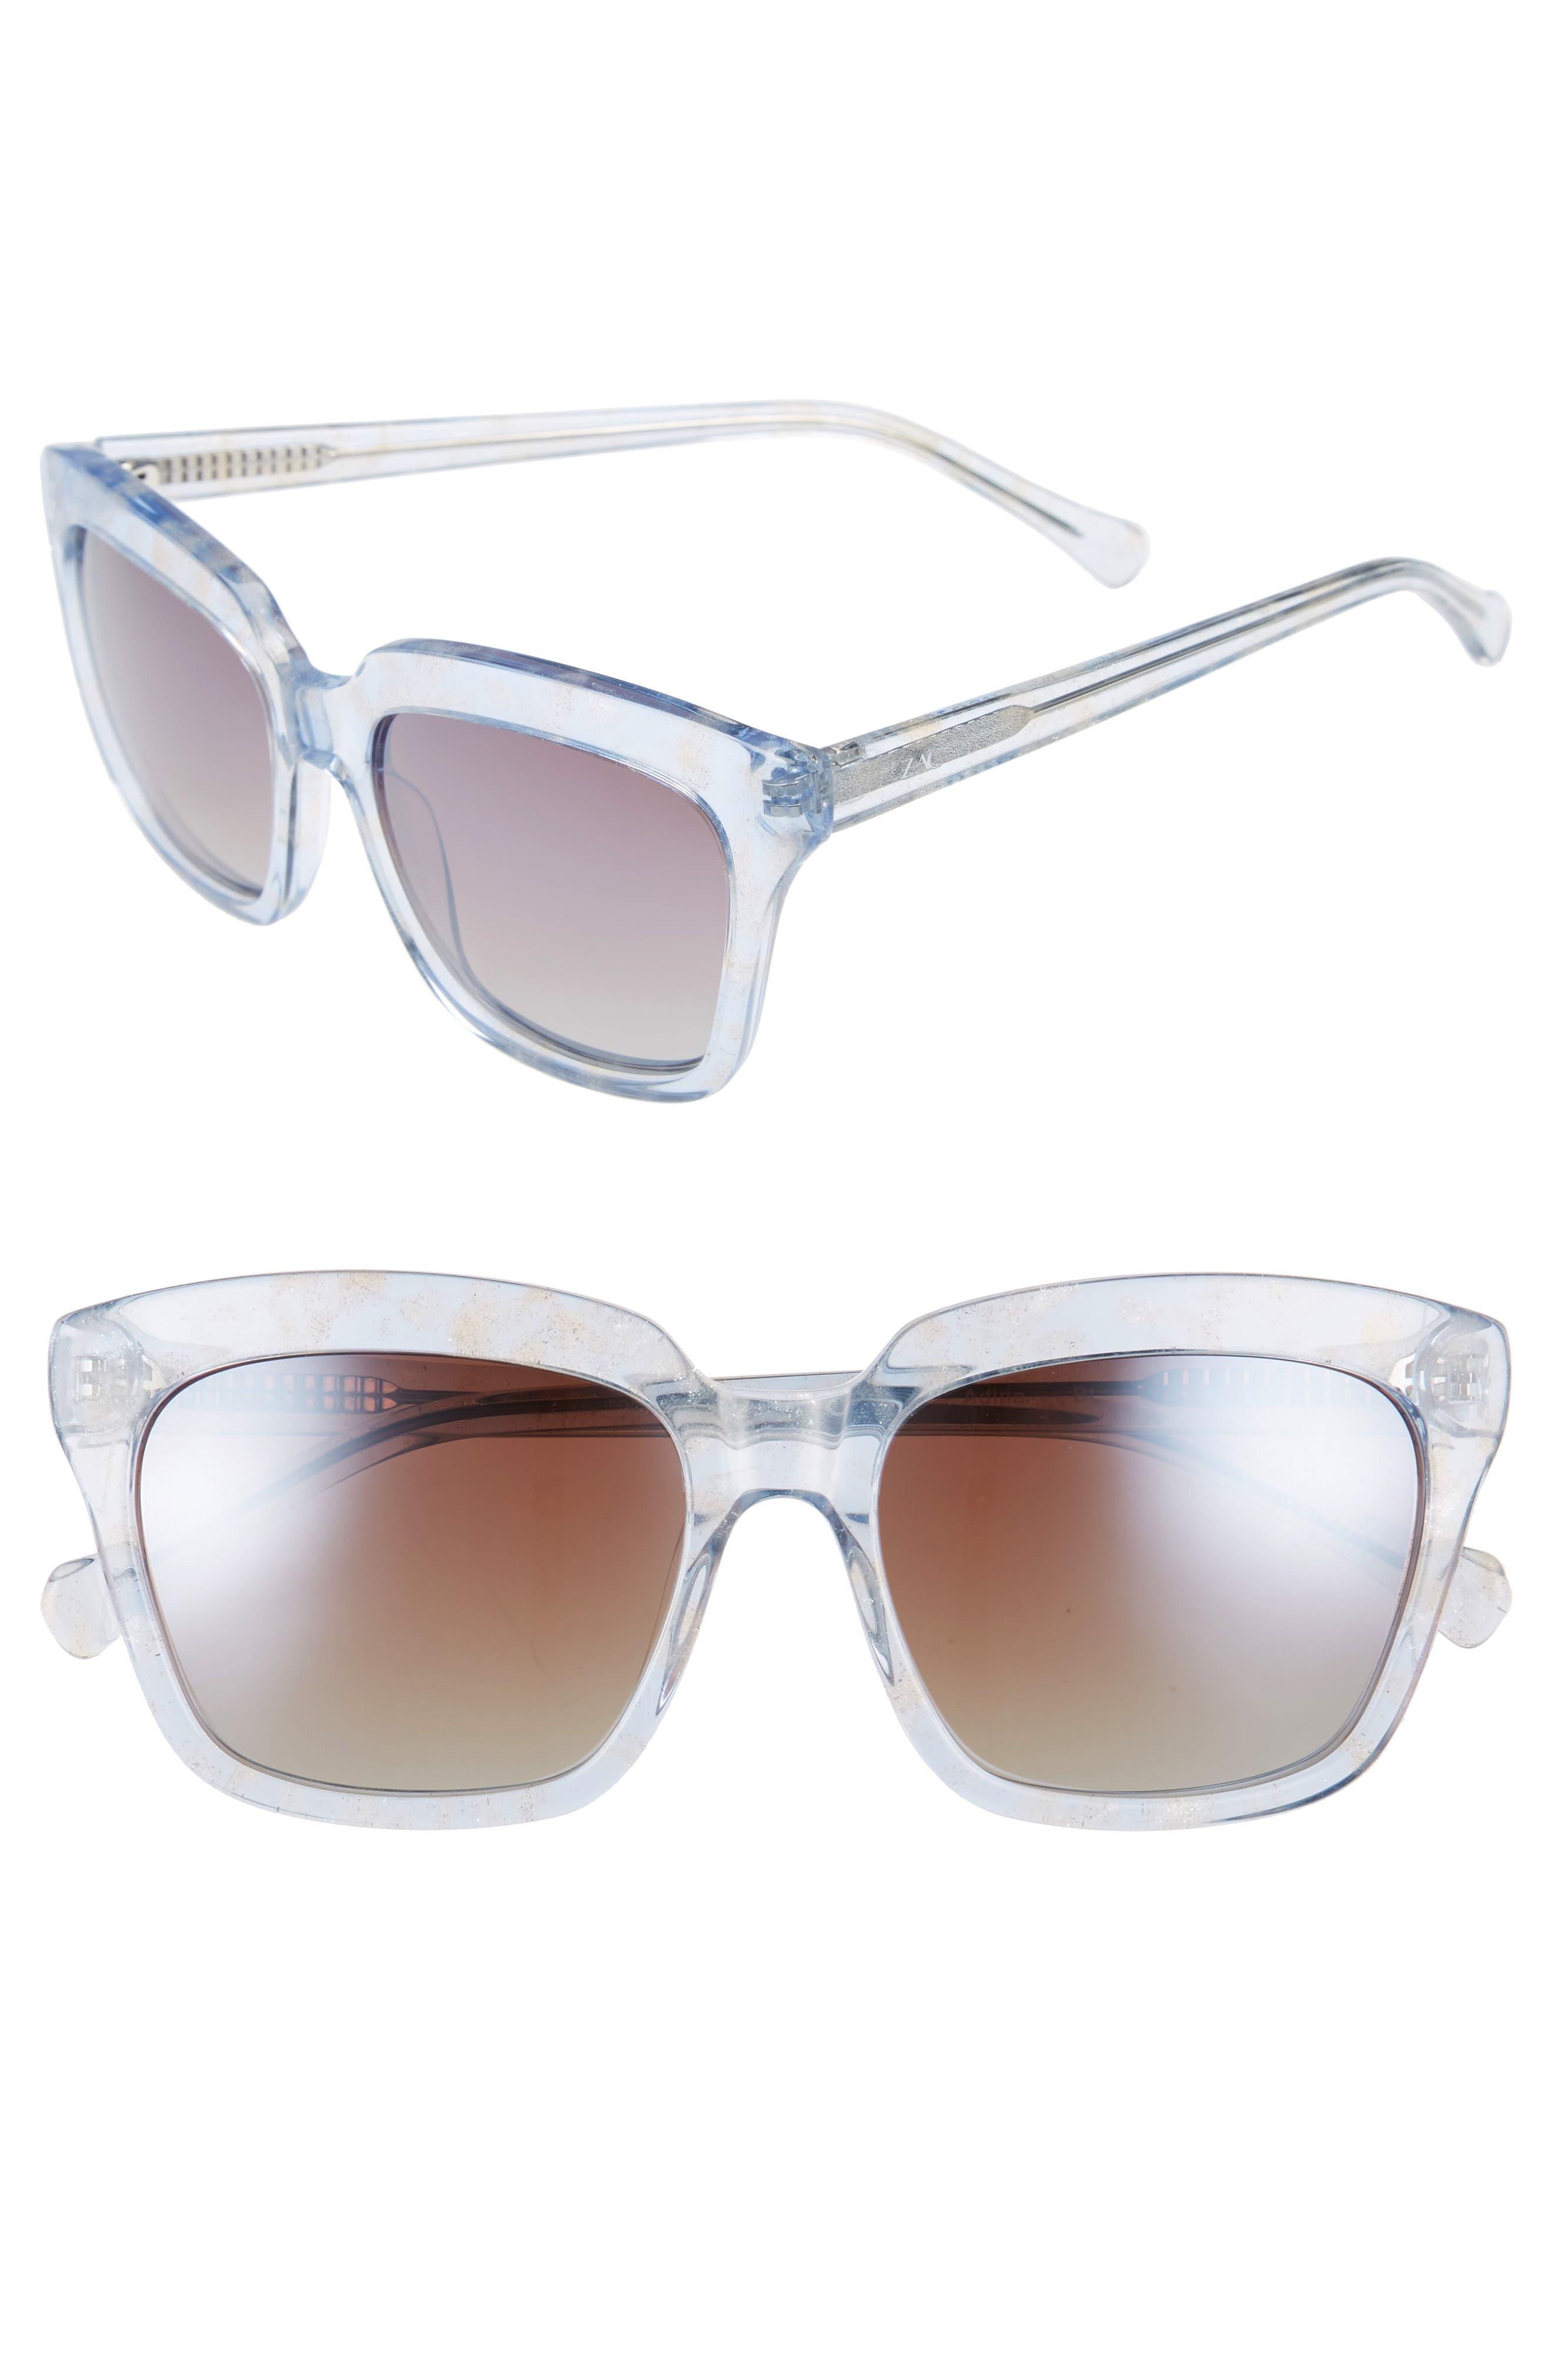 Adina 56mm Polarized Sunglasses,                         Main,                         color, Blue Polar/ Greige